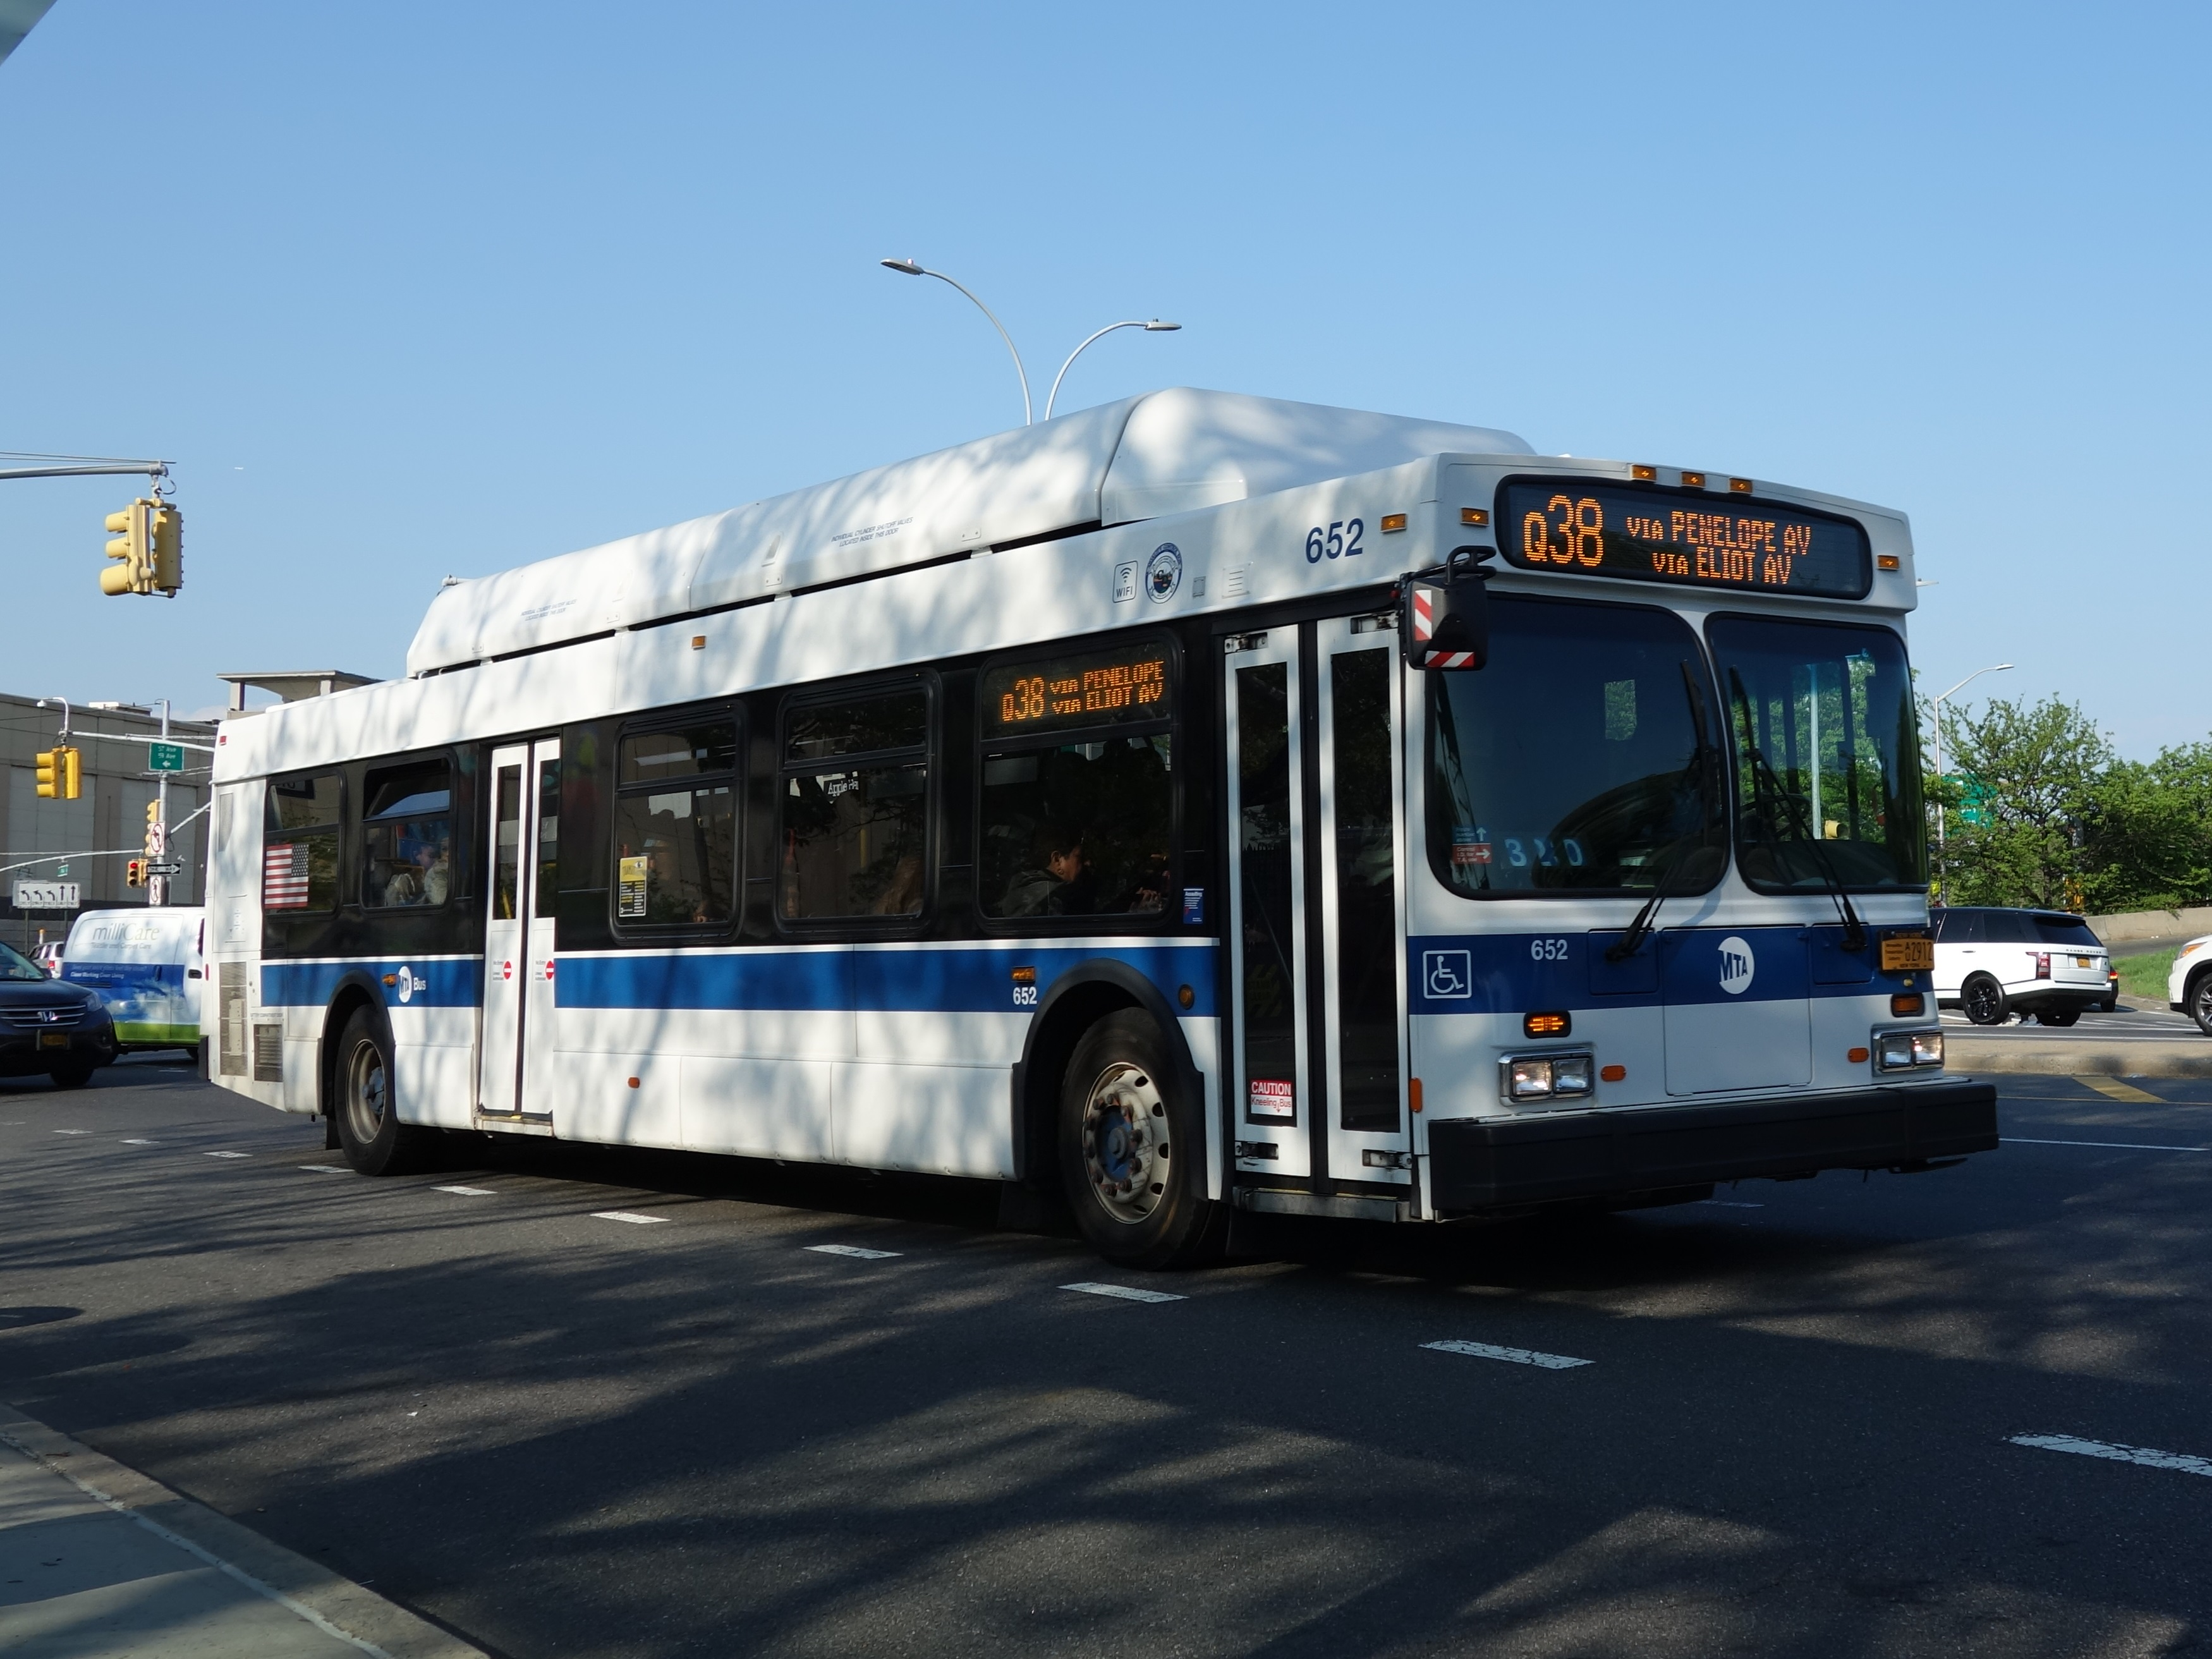 https://upload.wikimedia.org/wikipedia/commons/b/b4/MTA_Hoffman_Drive_21.jpg